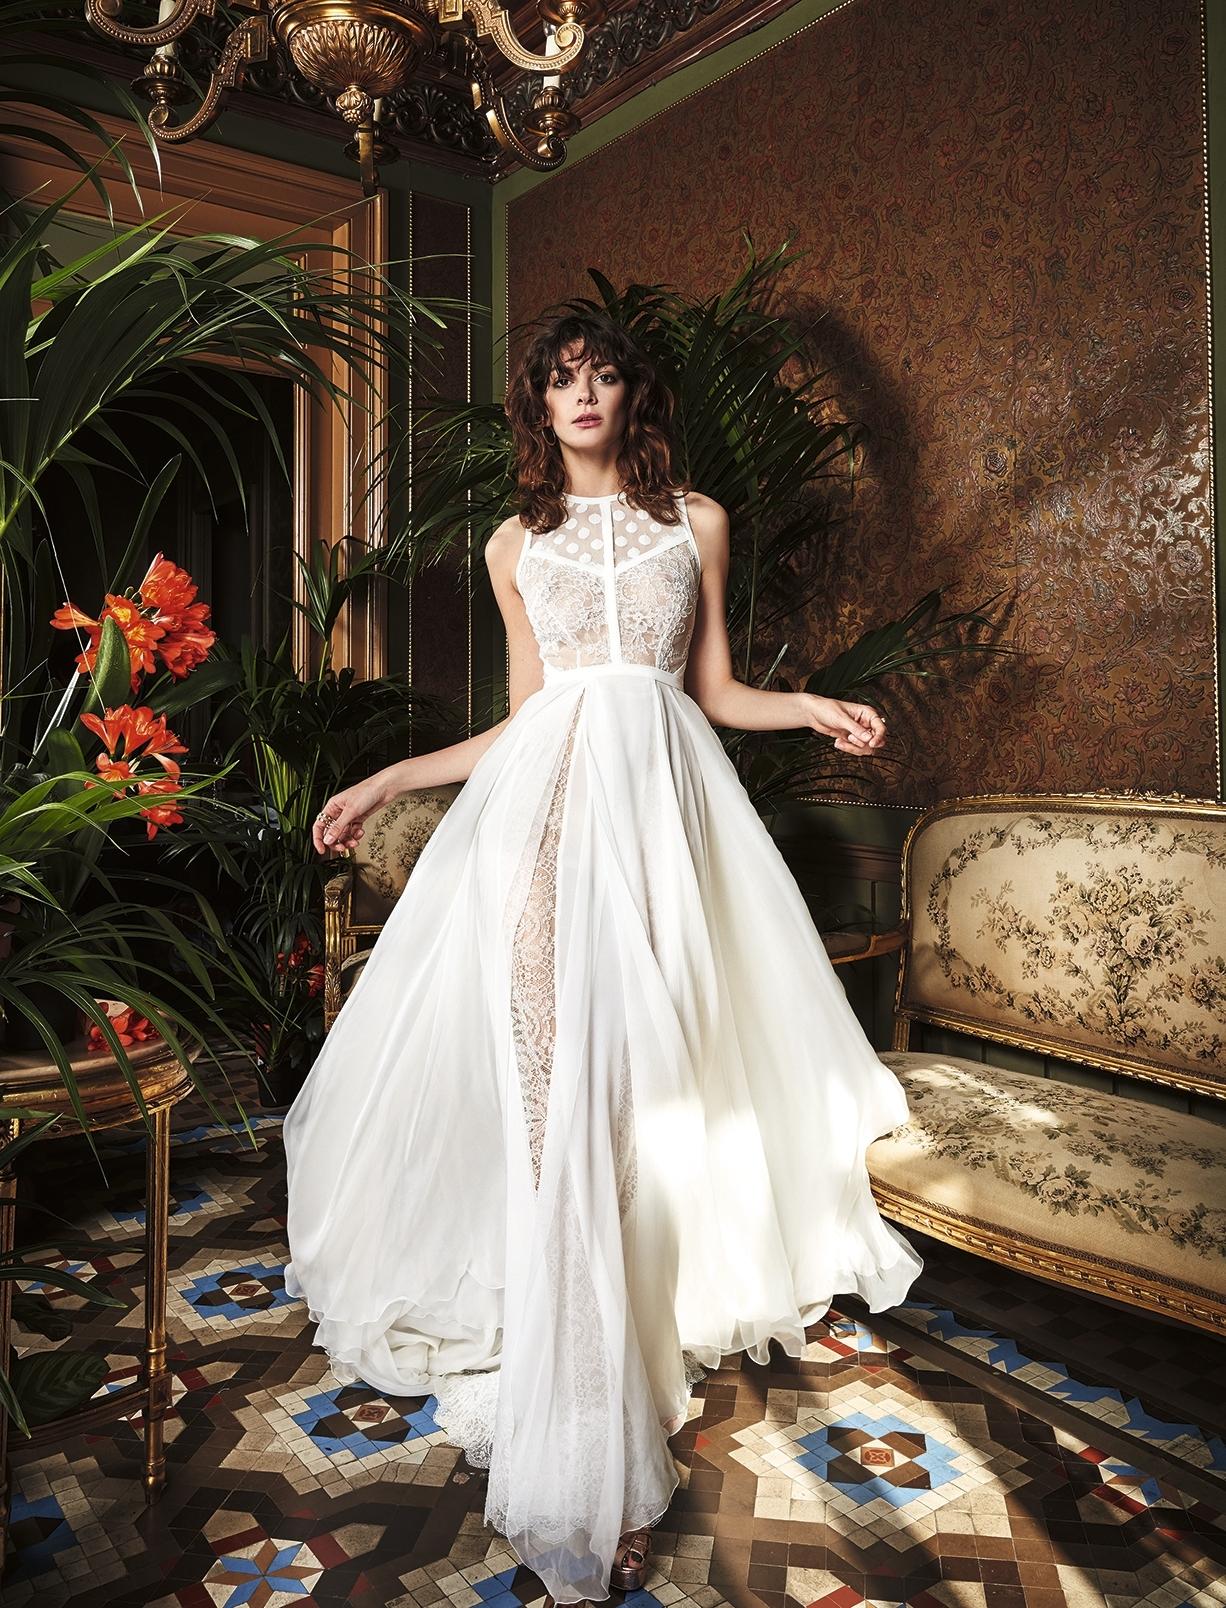 silk-chiffon-wedding-dress-original-romantic-bohemian-bride-beach-weddings-yolancris-fresa.jpg